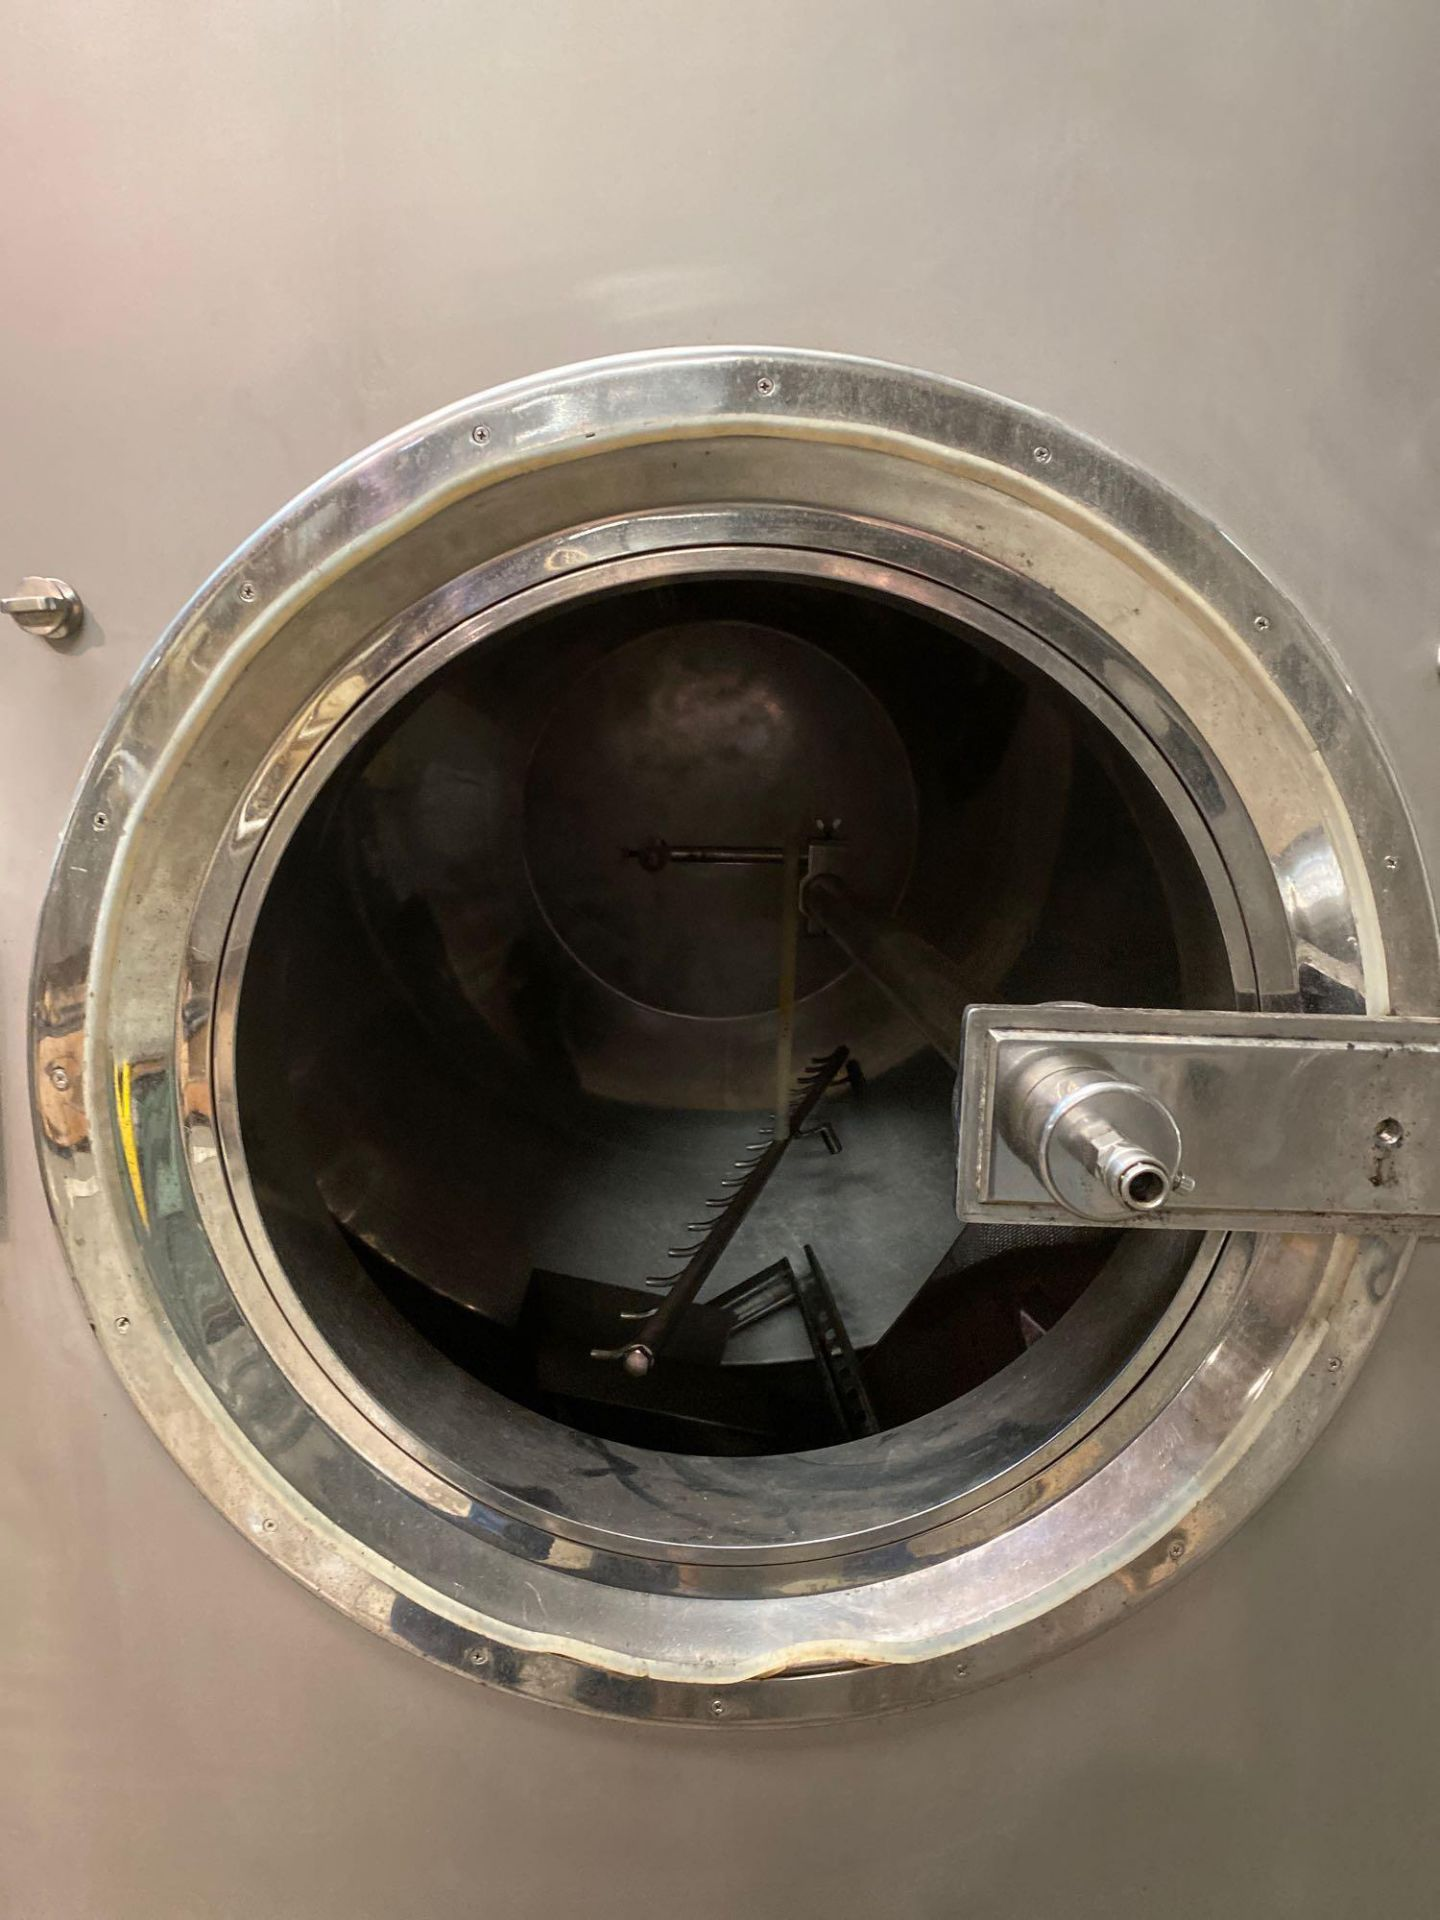 High Efficiency Intelligent Film Coating Machine/Pan Coater - Image 5 of 7